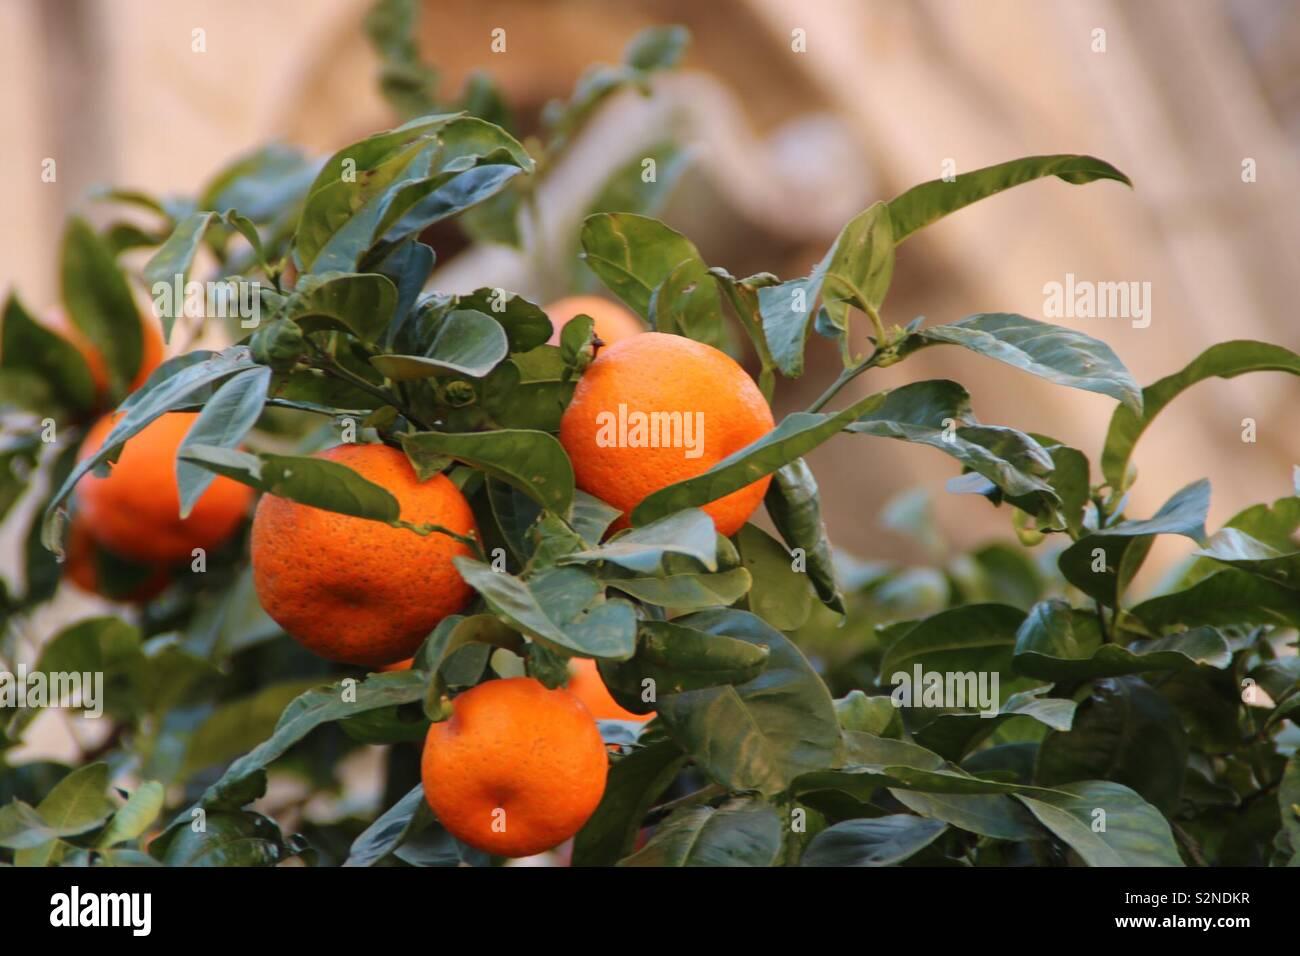 Orangen am Baum in Soller, Mallorca - oranges hanging on a tree in Soller - Stock Image